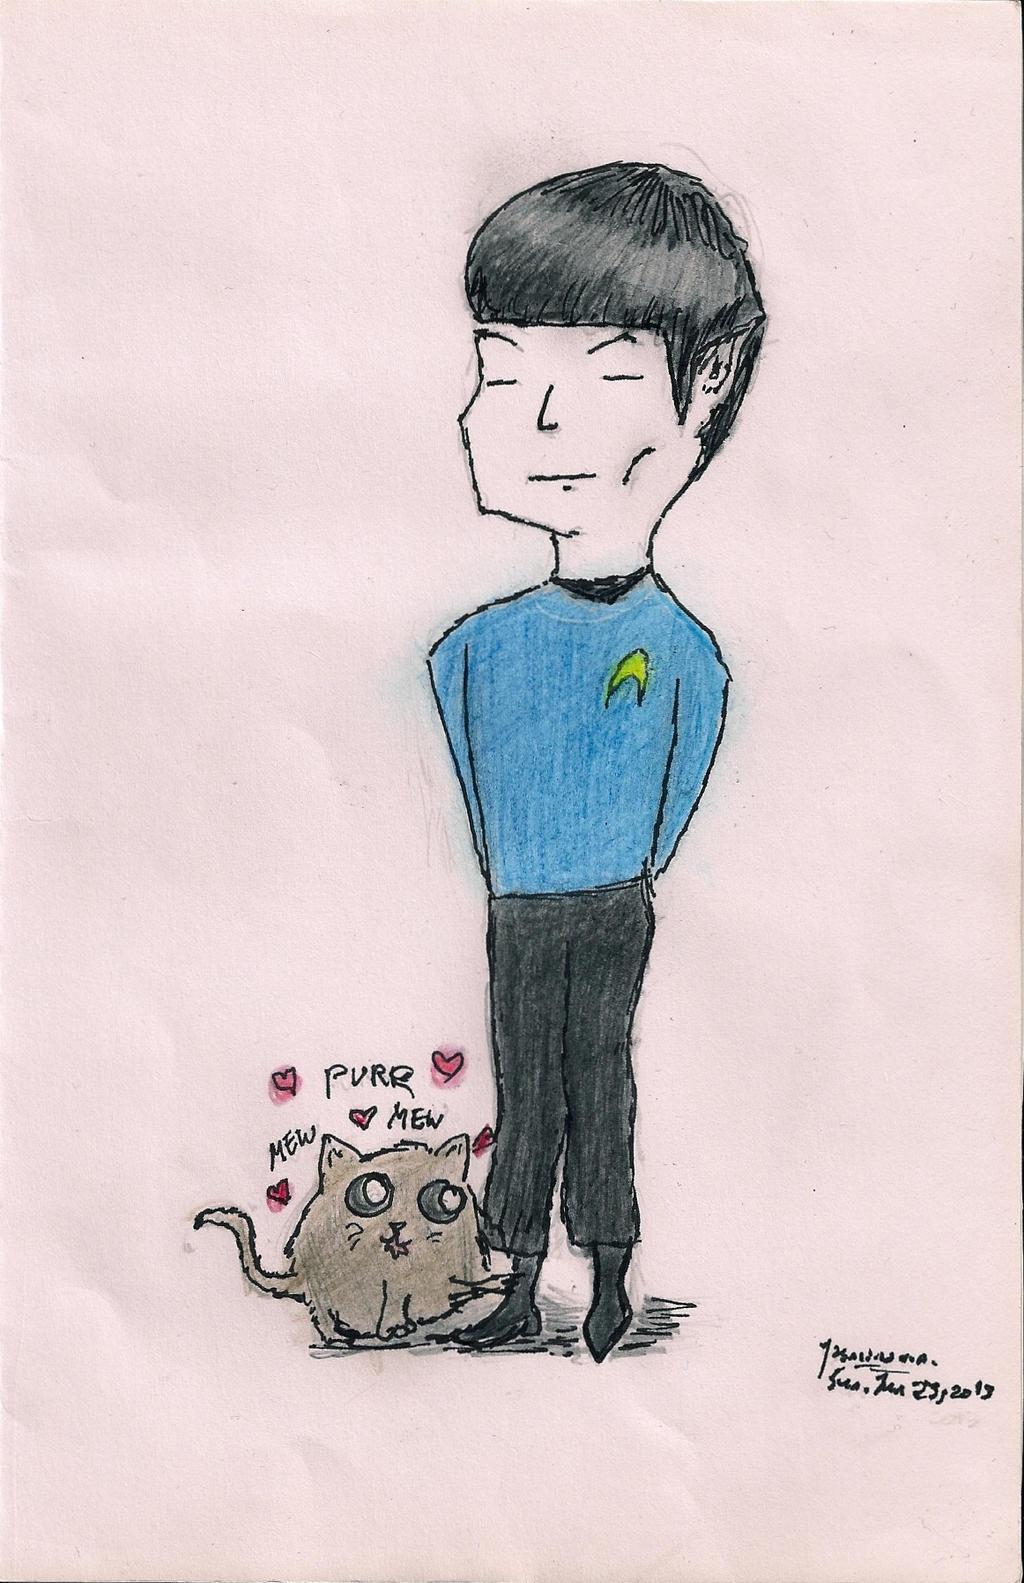 Spock Versus Kitten